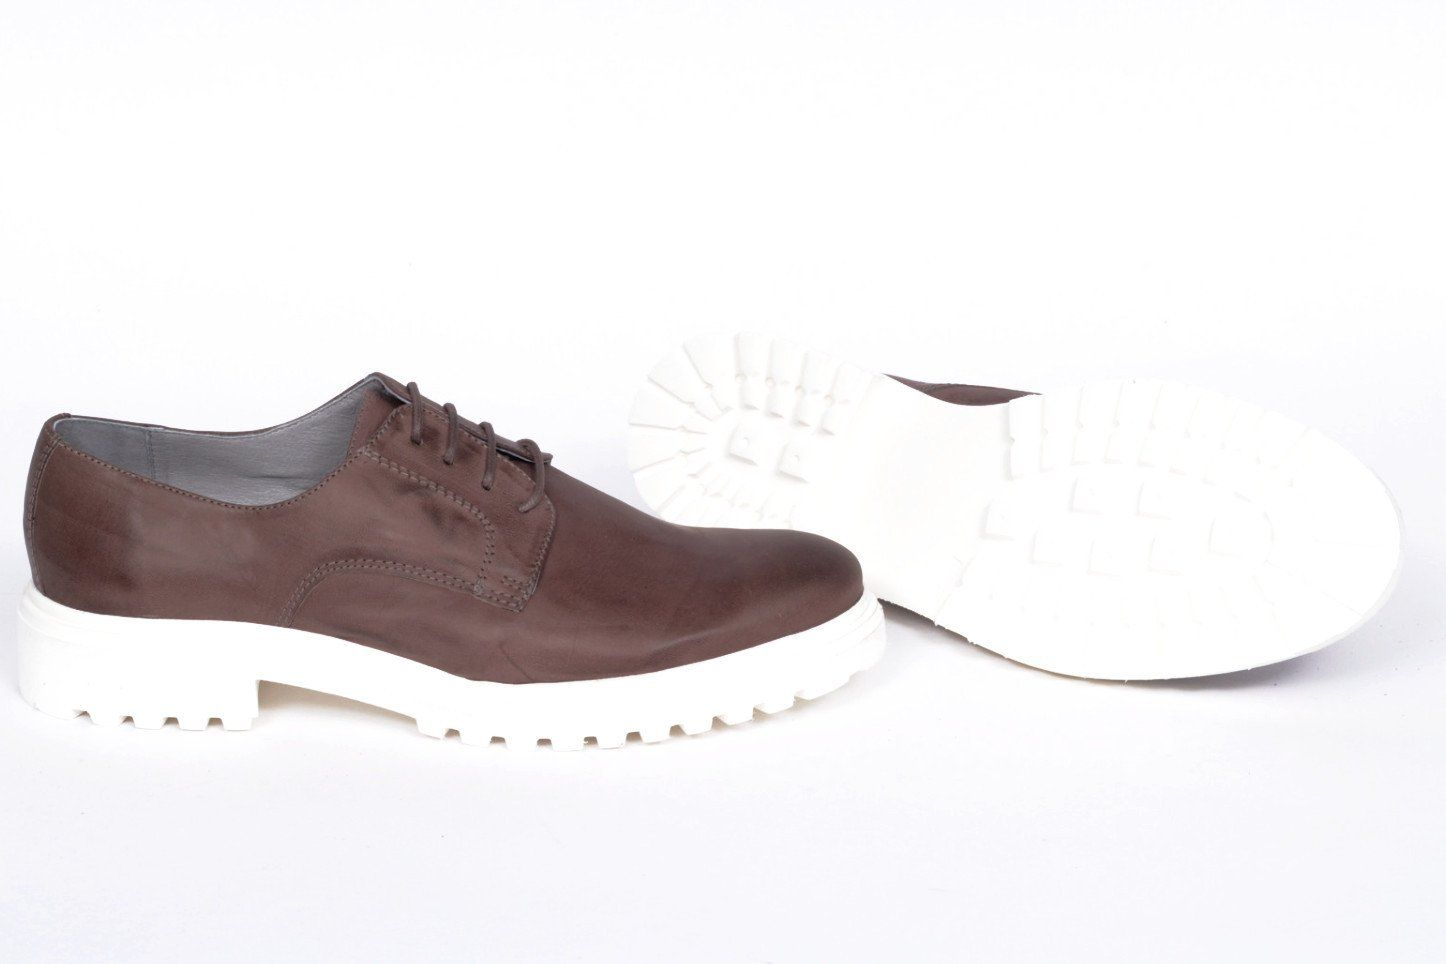 61b9d9c4f268e miMaO Insta Taupe – Zapato hombre cómodo piel extraligero - mens extralight  suede green leather shoes